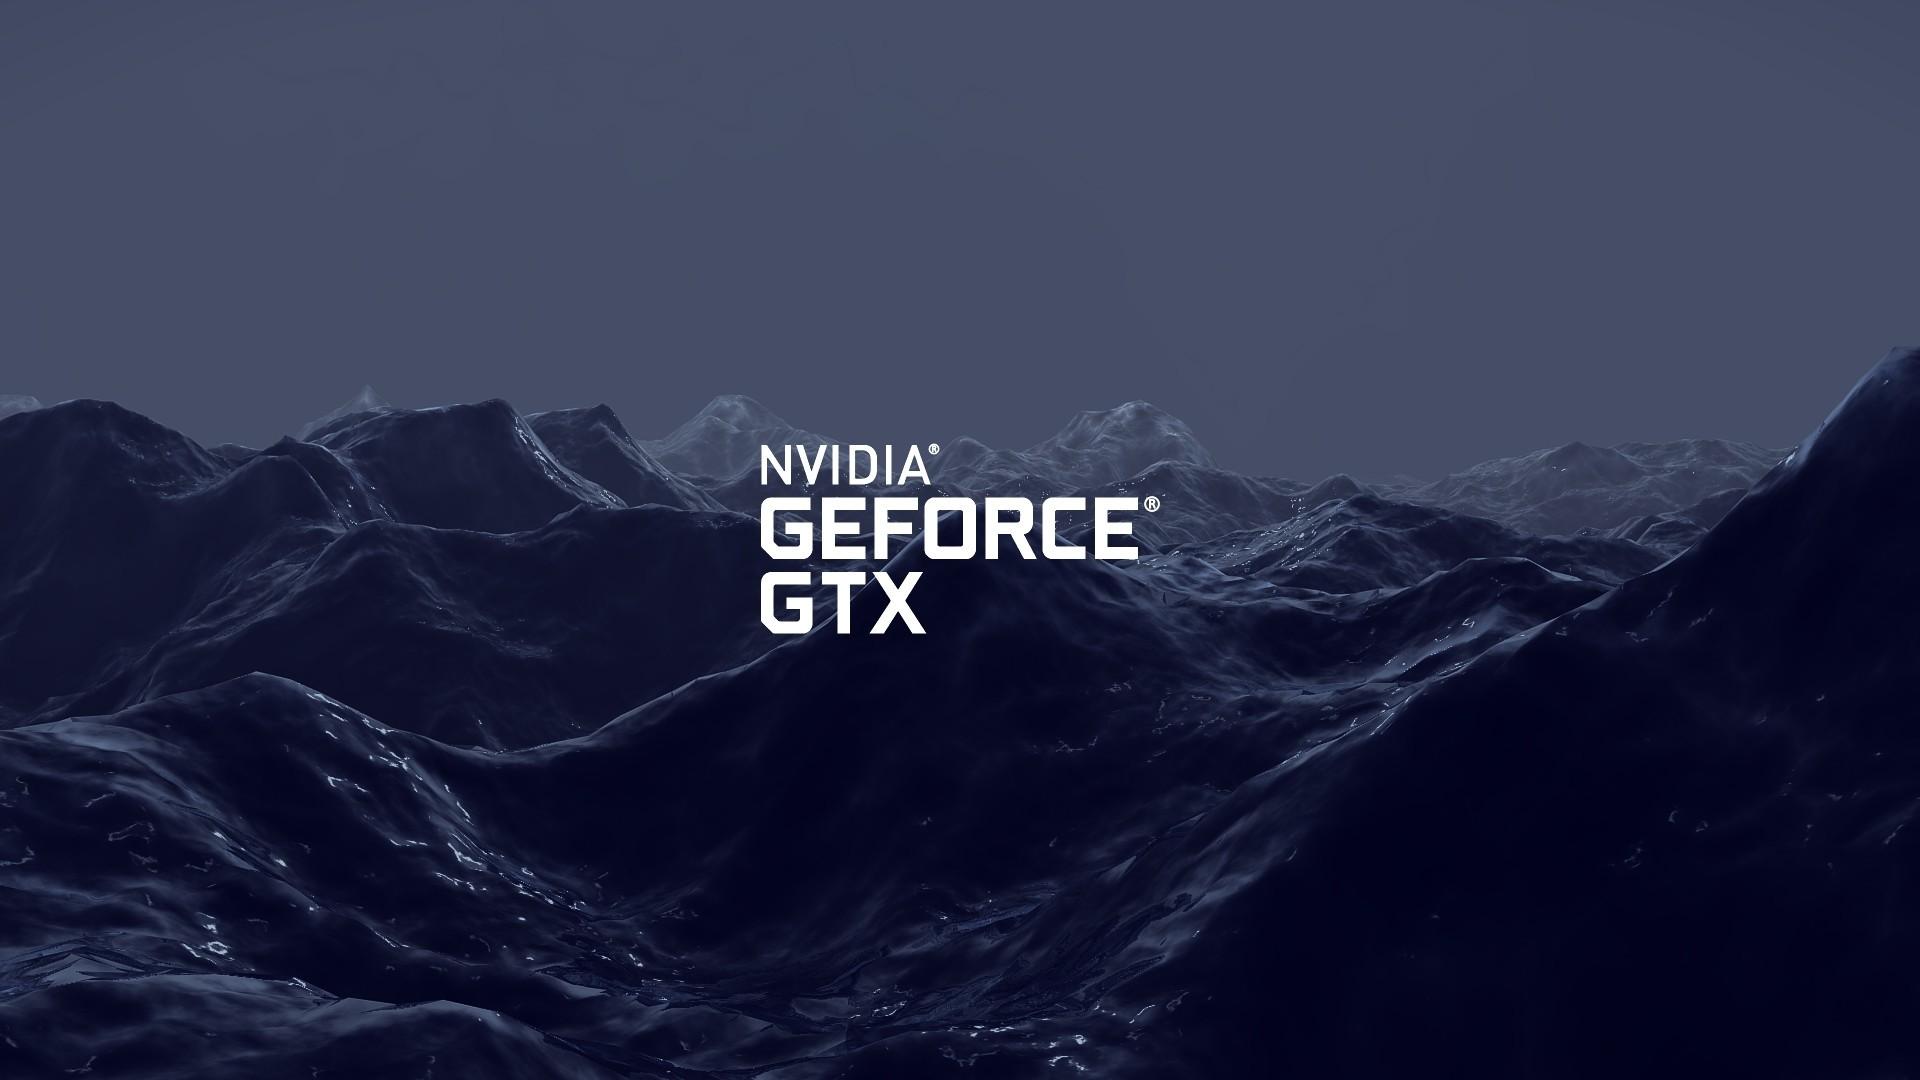 Nvidia PC Wallpaper